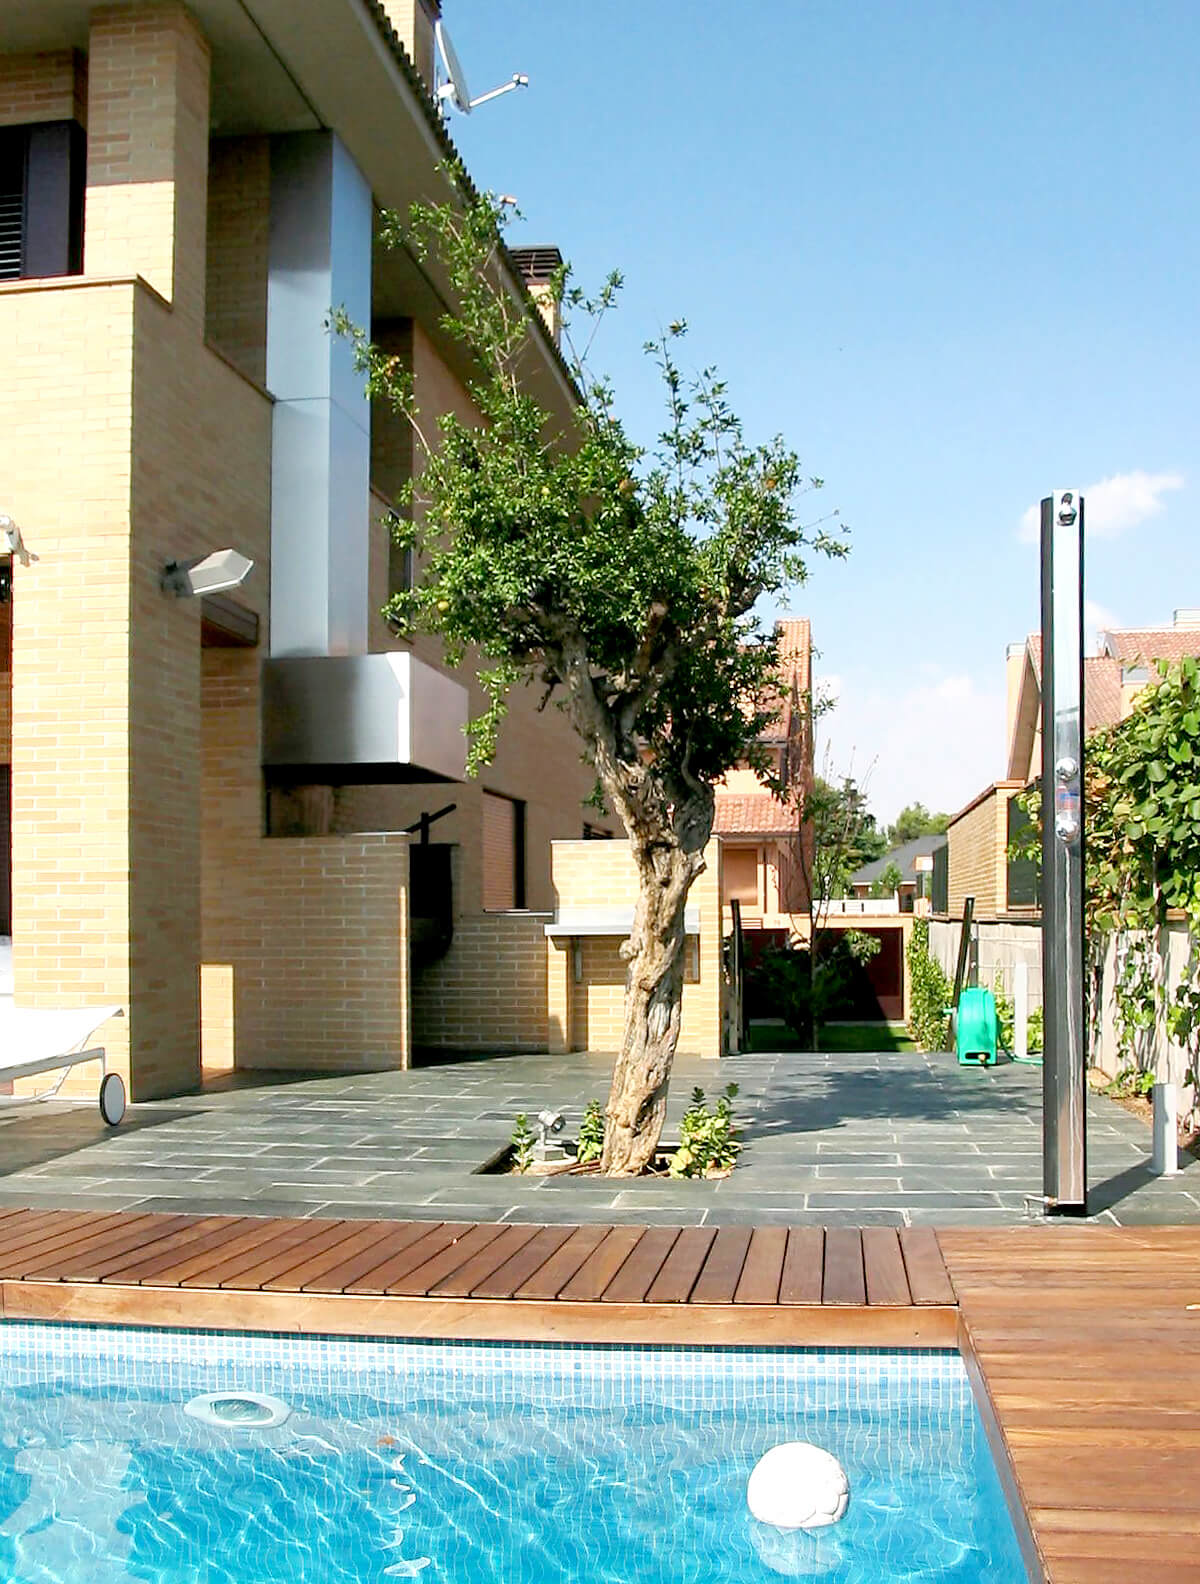 2 Viviendas unifamiliares en Aravaca